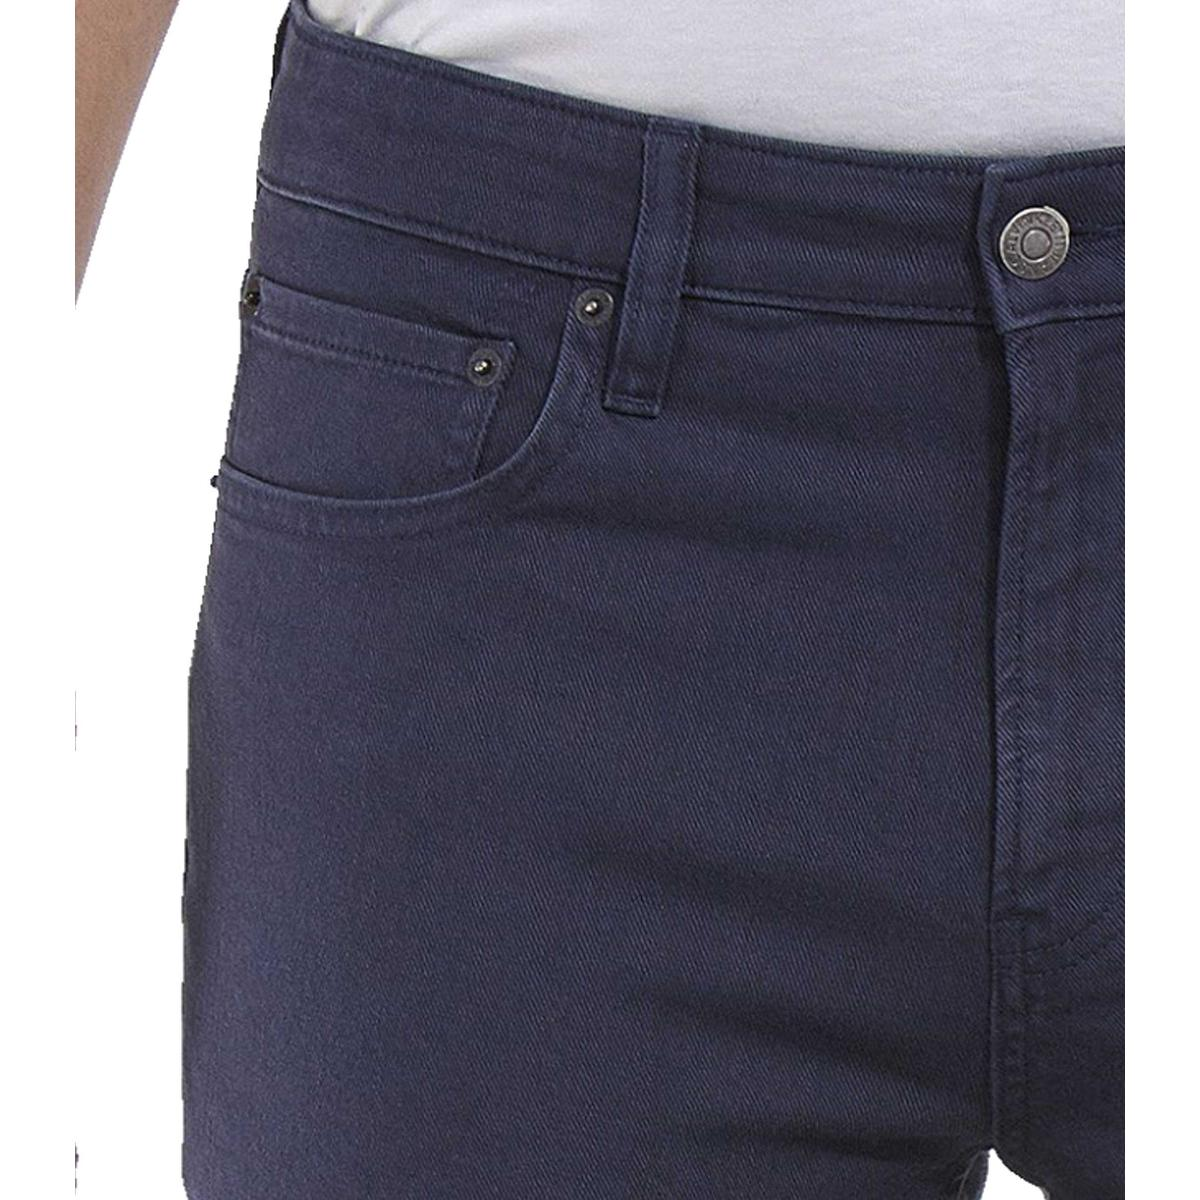 Pantaloni Calvin Klein Jeans SLIM STRETCH TWILL da uomo rif. J30J310380